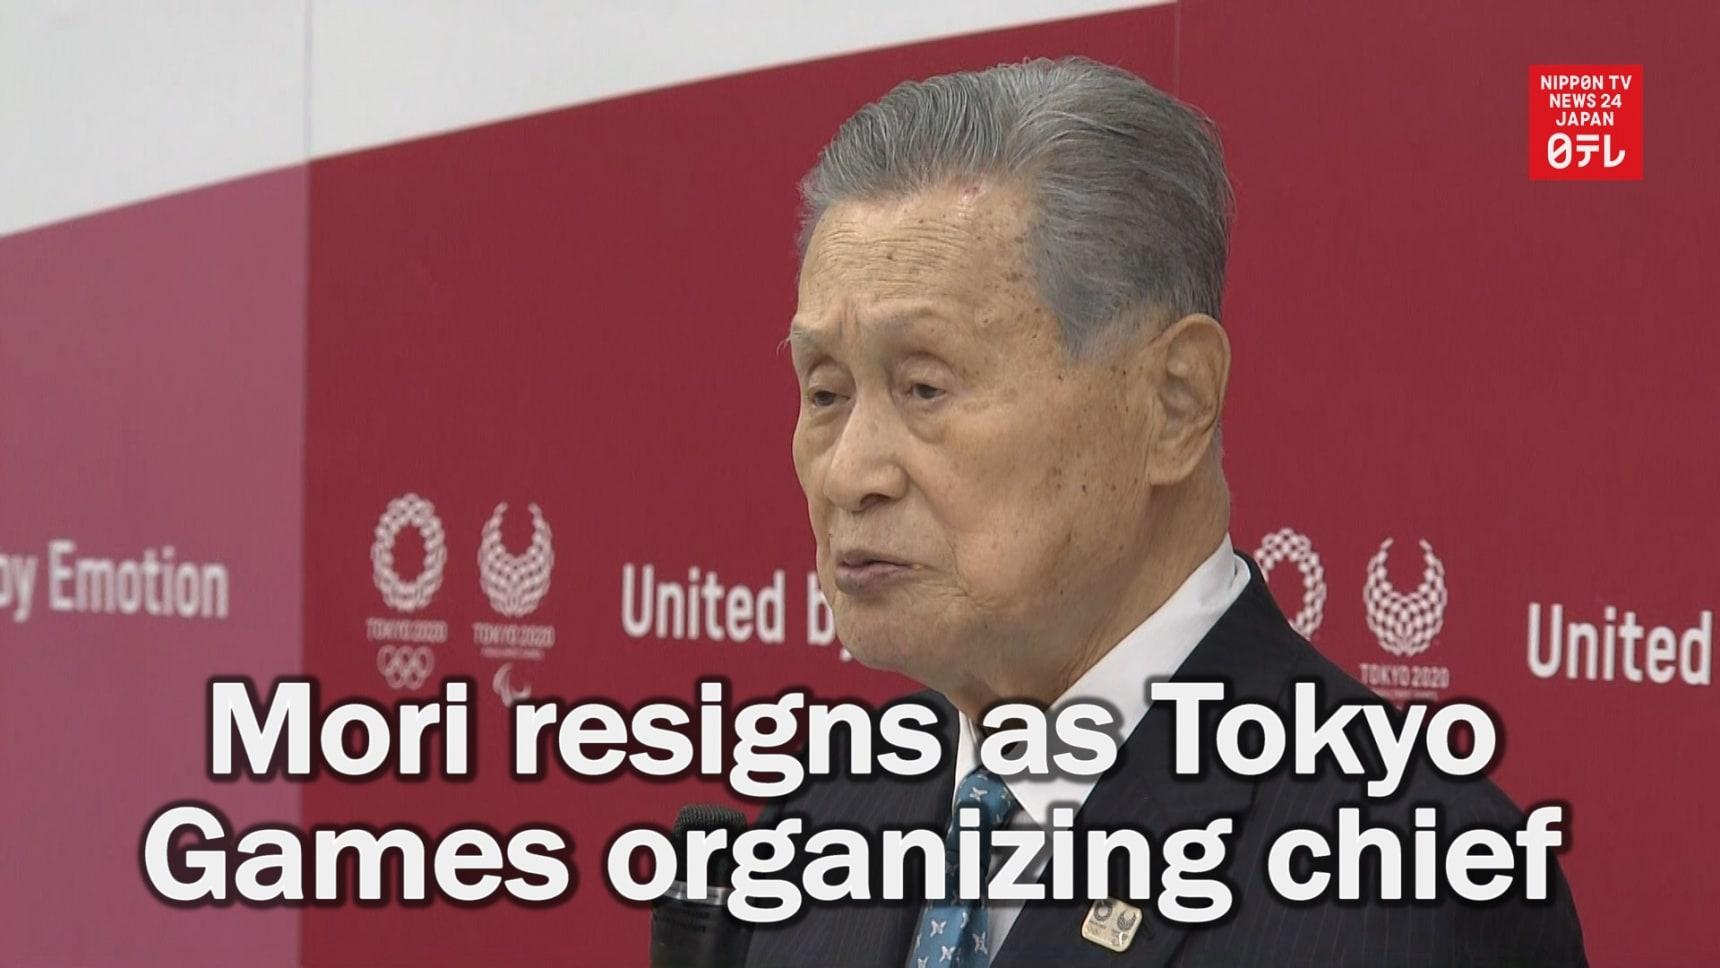 Mori Resigns as Tokyo Games Organizing Chief